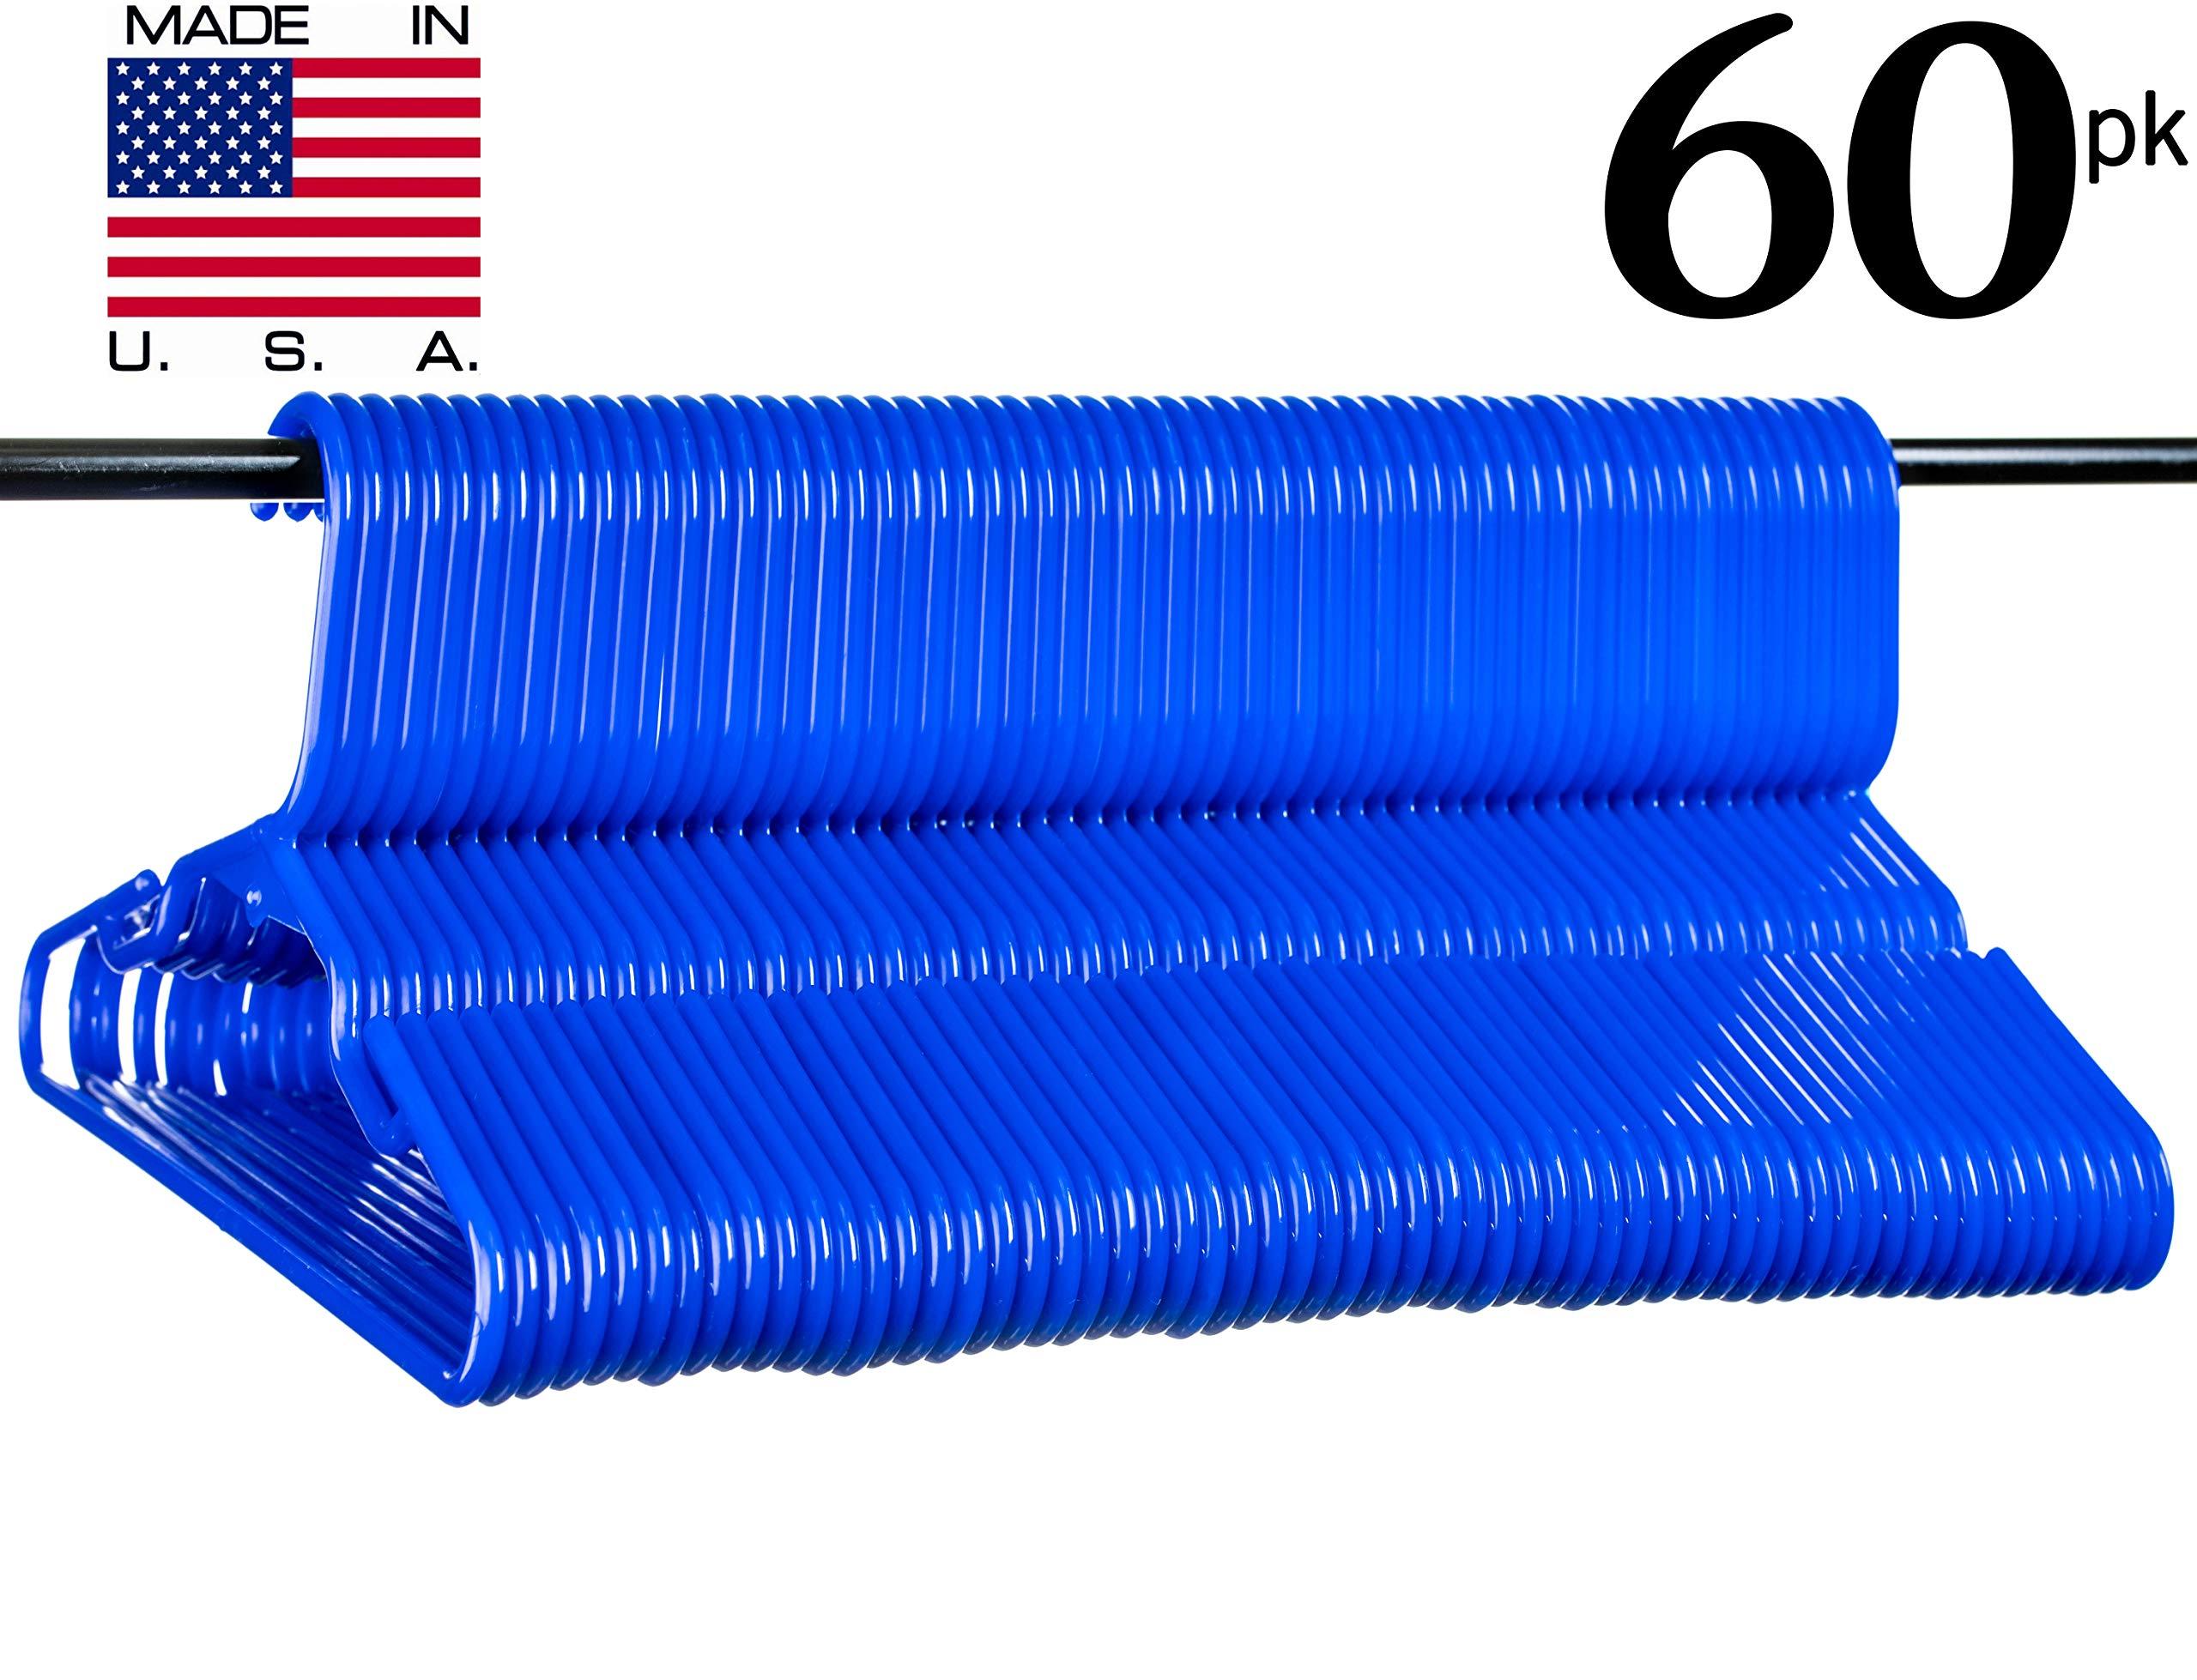 Neaties USA Made Children's Small Blue Plastic Hangers, 60pk